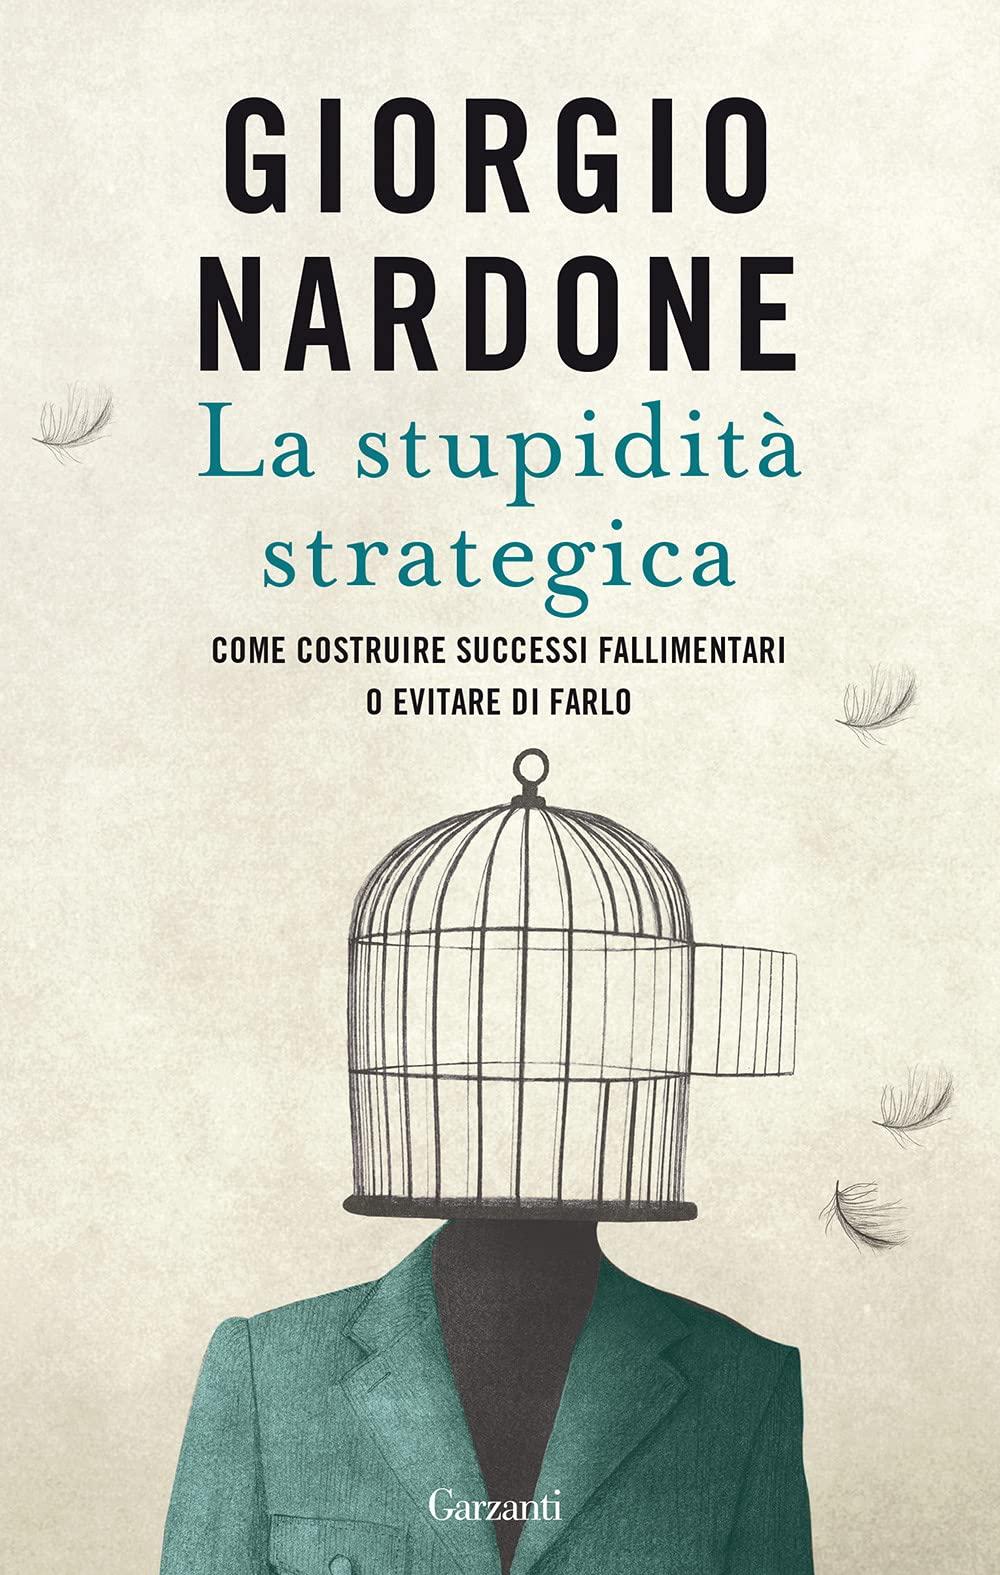 La stupidità strategica Nardone www.ultimavoce.it Garzanti